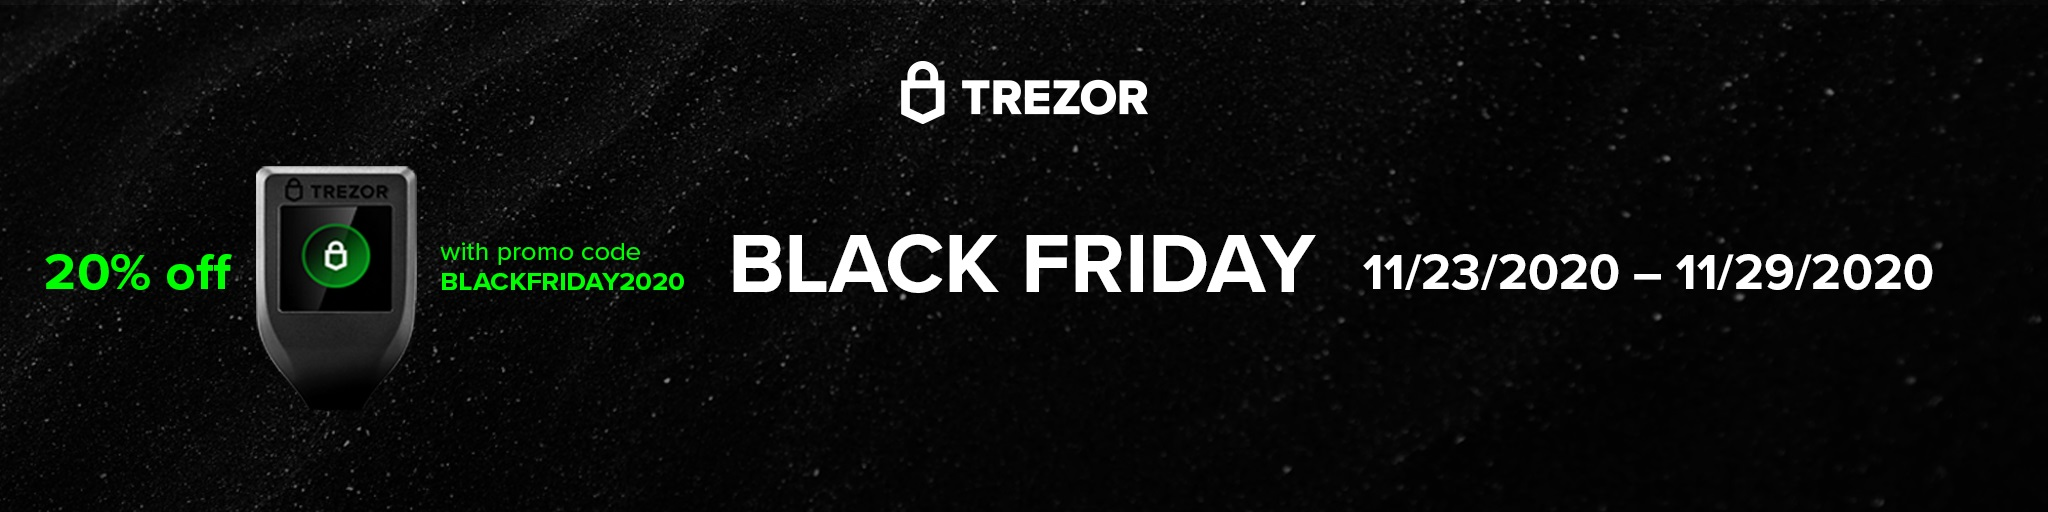 trezor-black-friday-2020